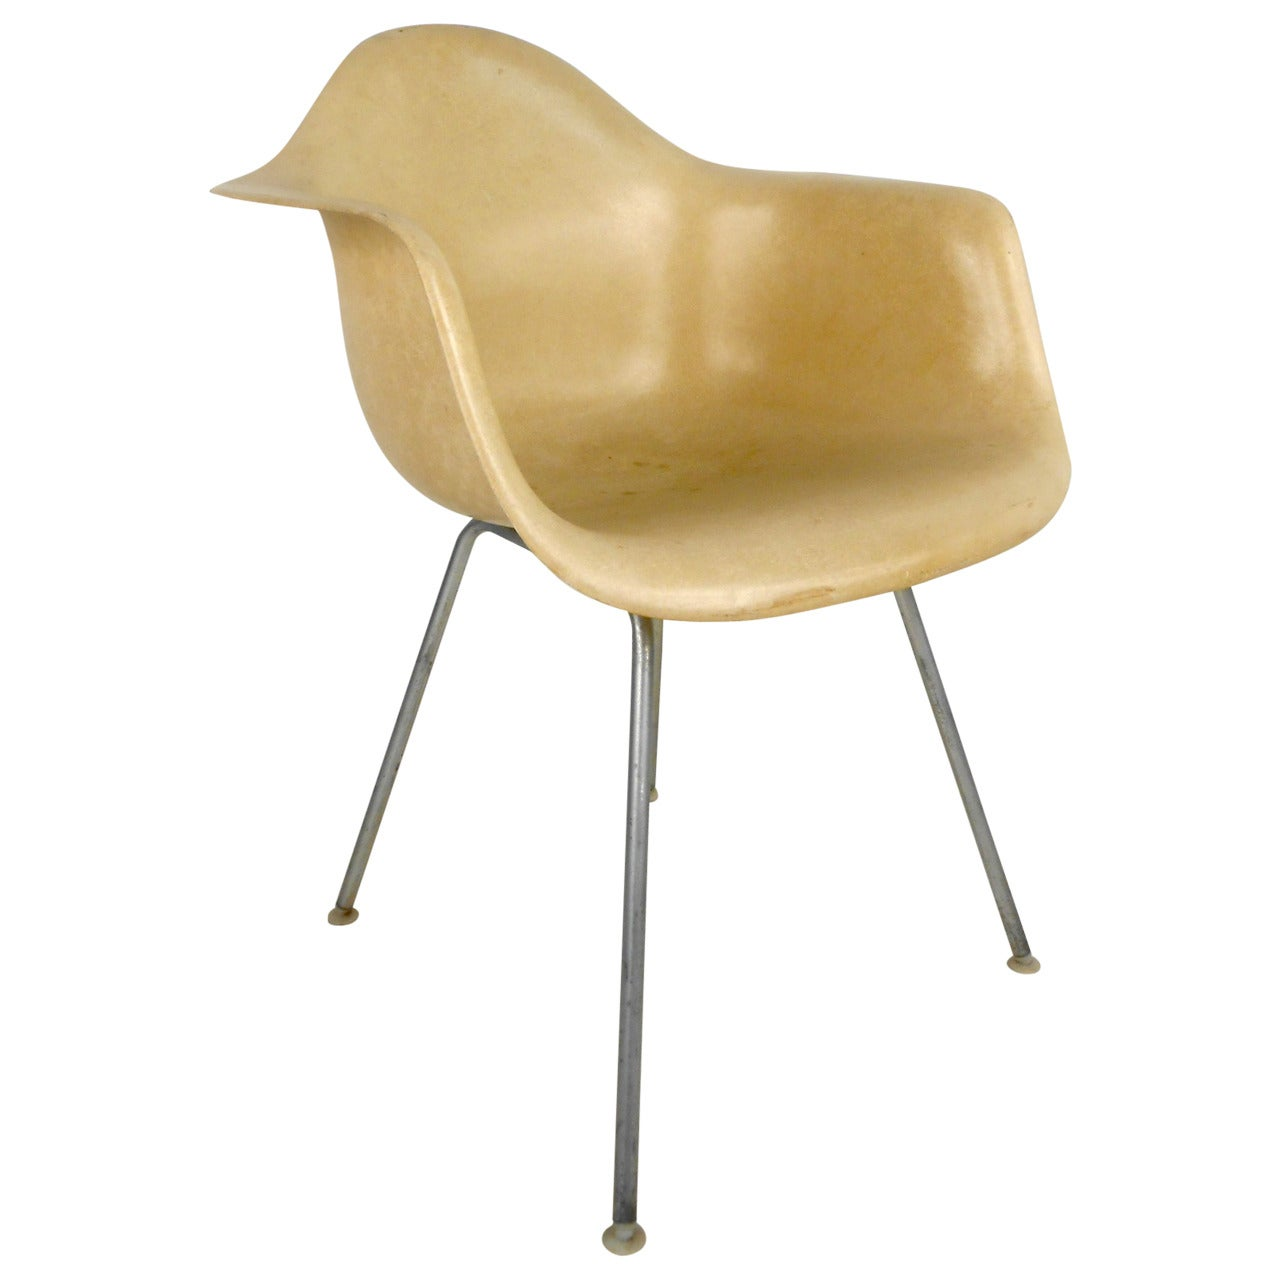 Mid-Century Modern Fiberglass Shell Chair by Eames for Herman Miller